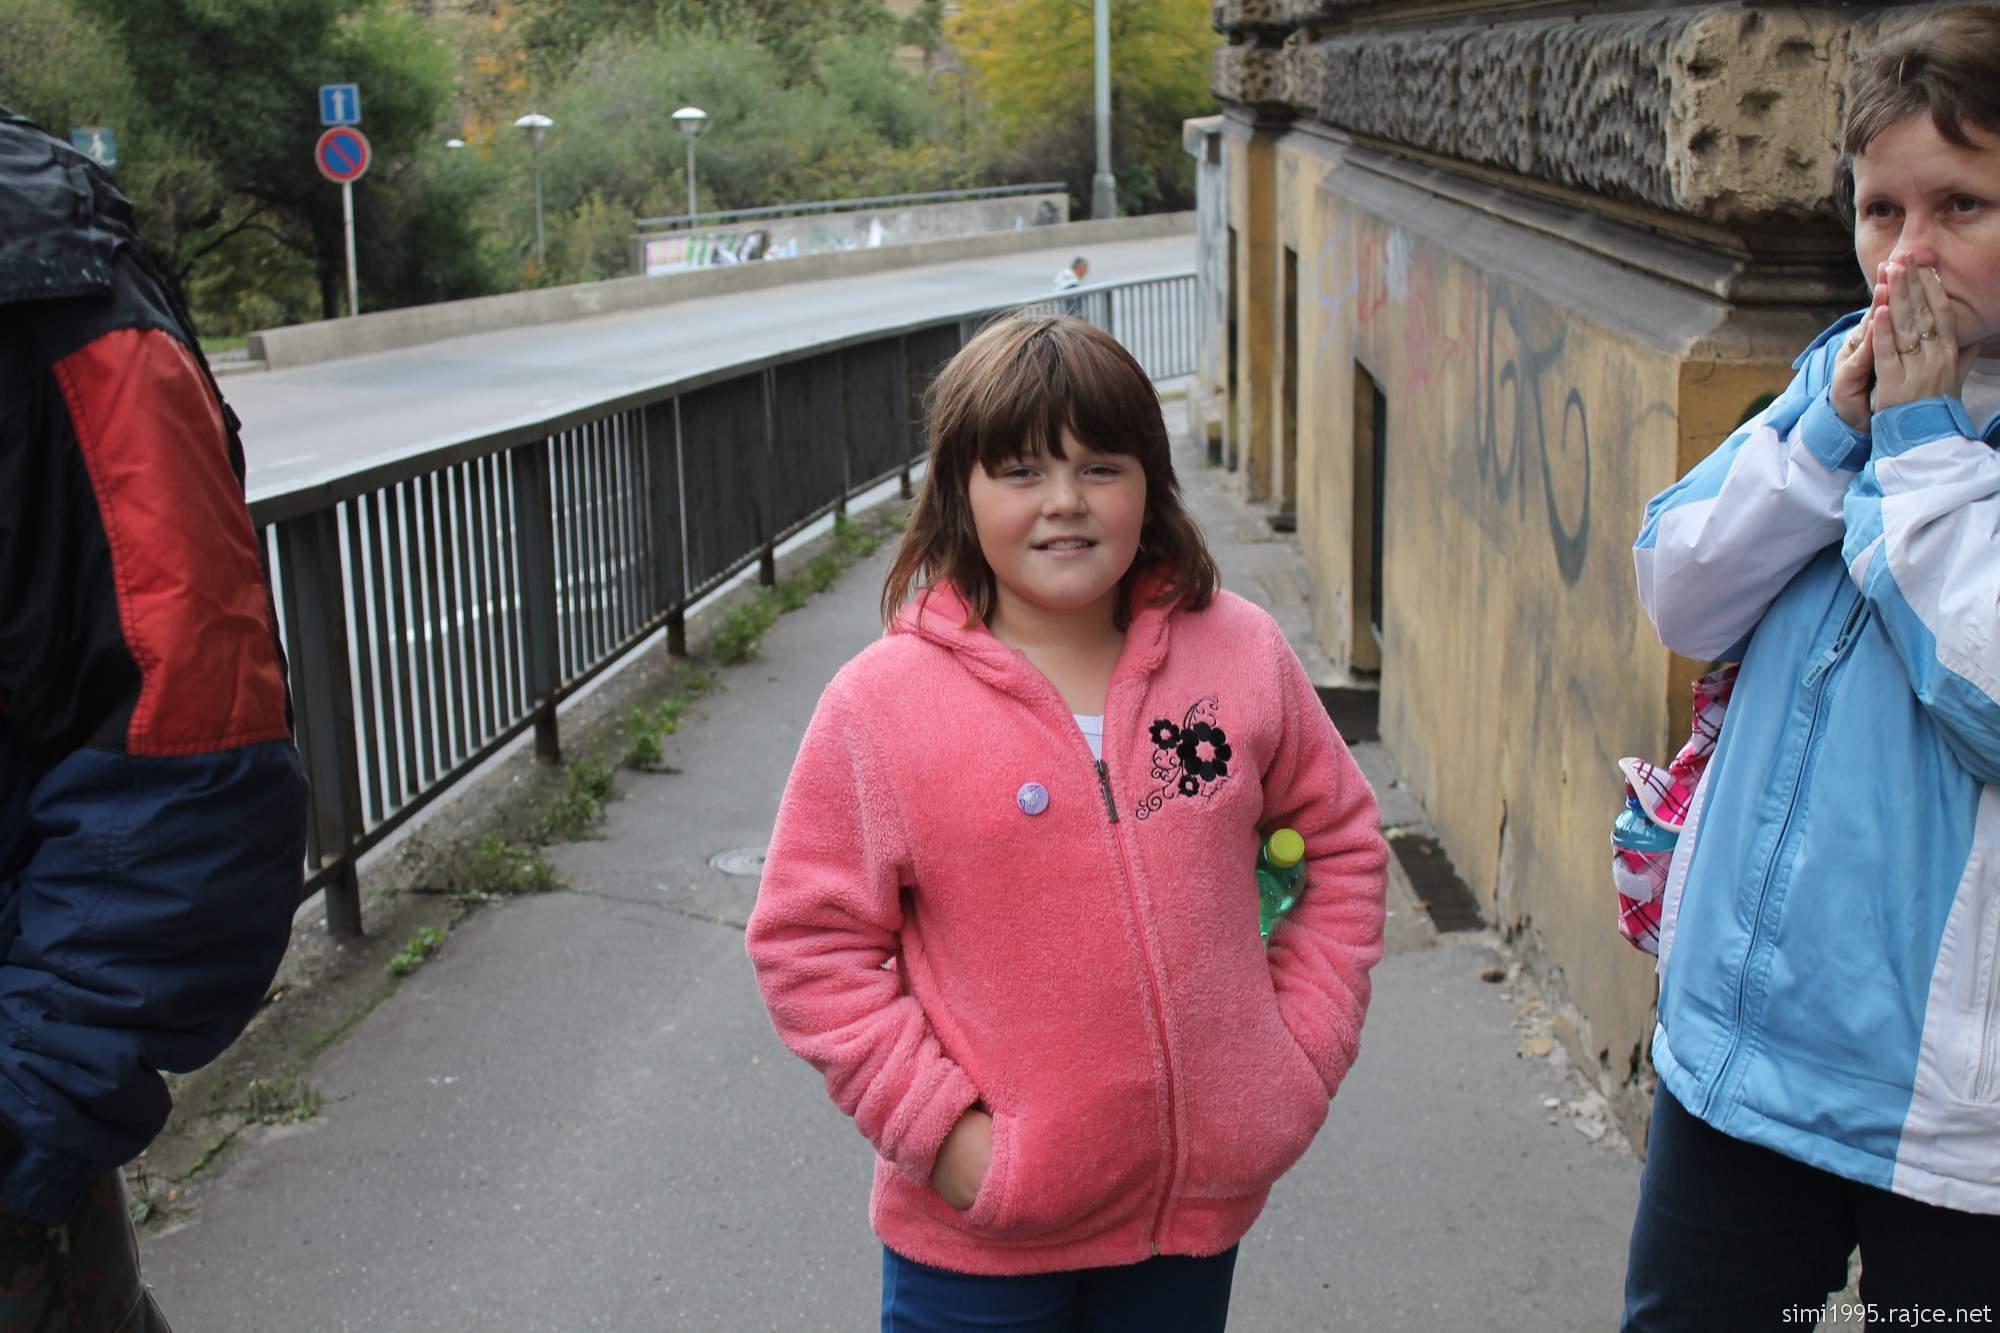 Rajce.idnes.child&rajce.2010.rajce.idnes.cz za